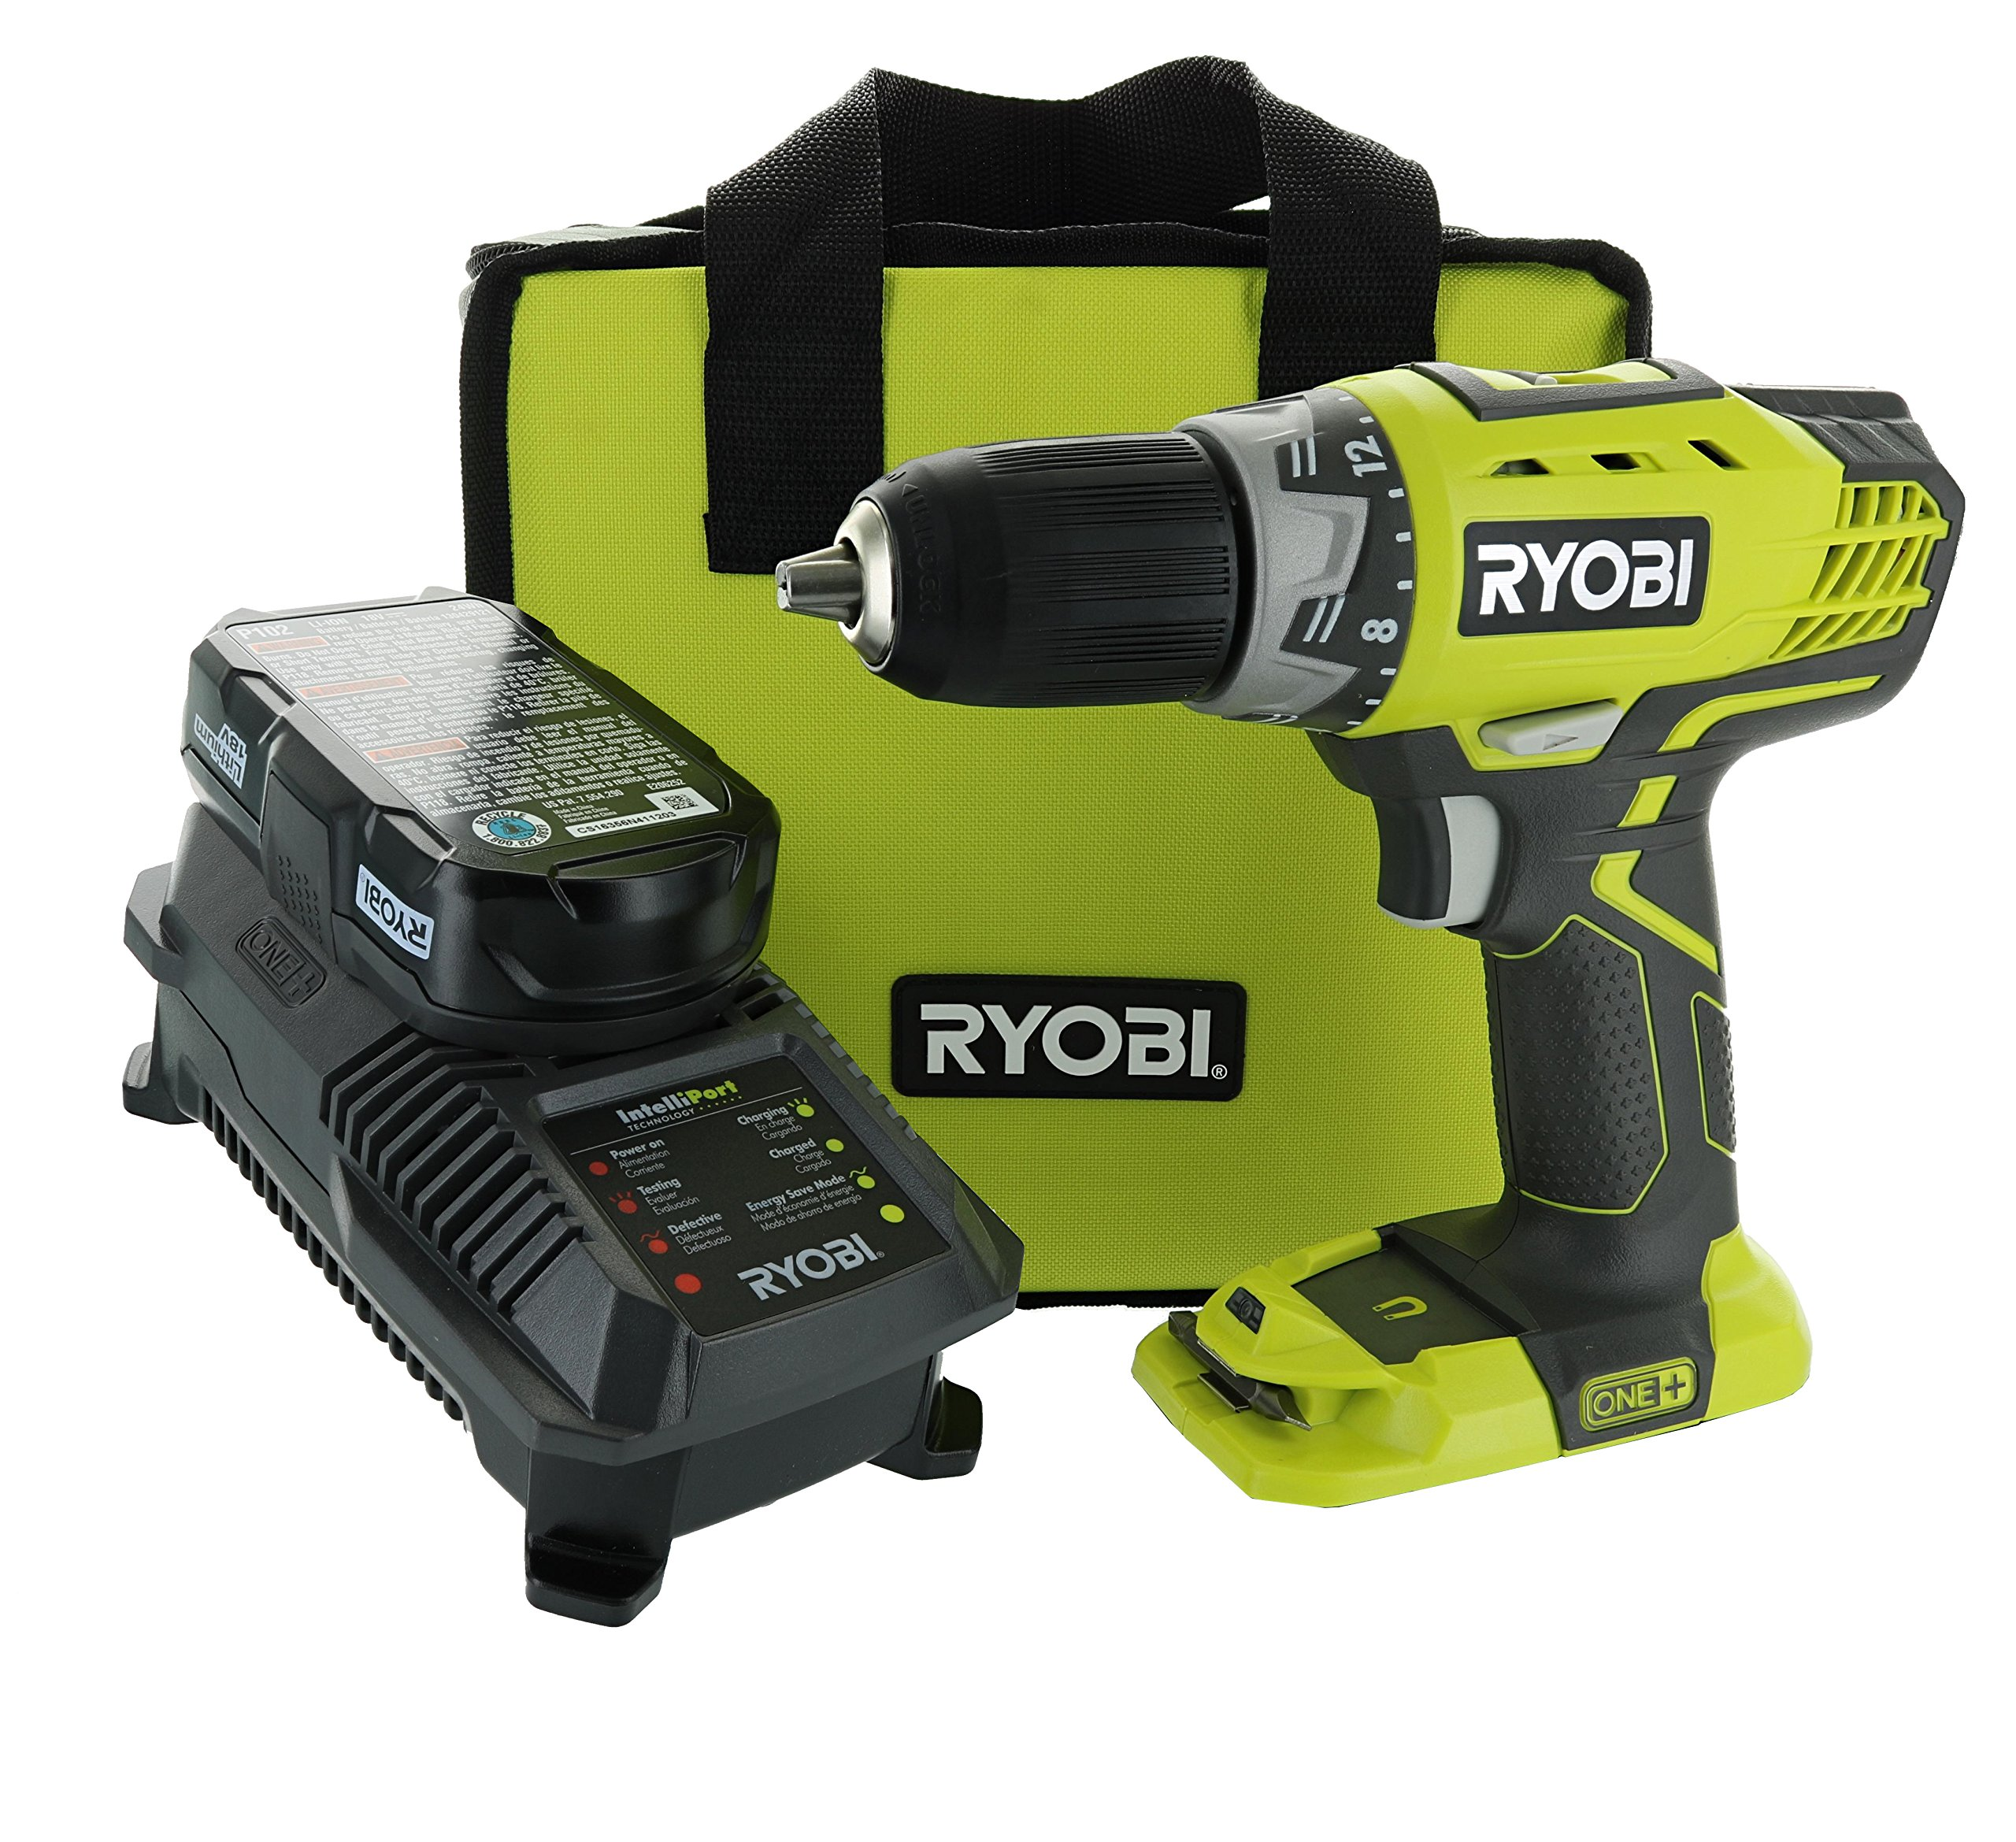 Ryobi P1811 One+ Compact Drill / Driver Kit (5 Piece Bundle: 1x P208 Drill / Driver Power Tool, 2x P102 18 Volt Battery, 1x P118 18 Volt Battery Charger, 1x Lime Green Ryobi Tool Bag)